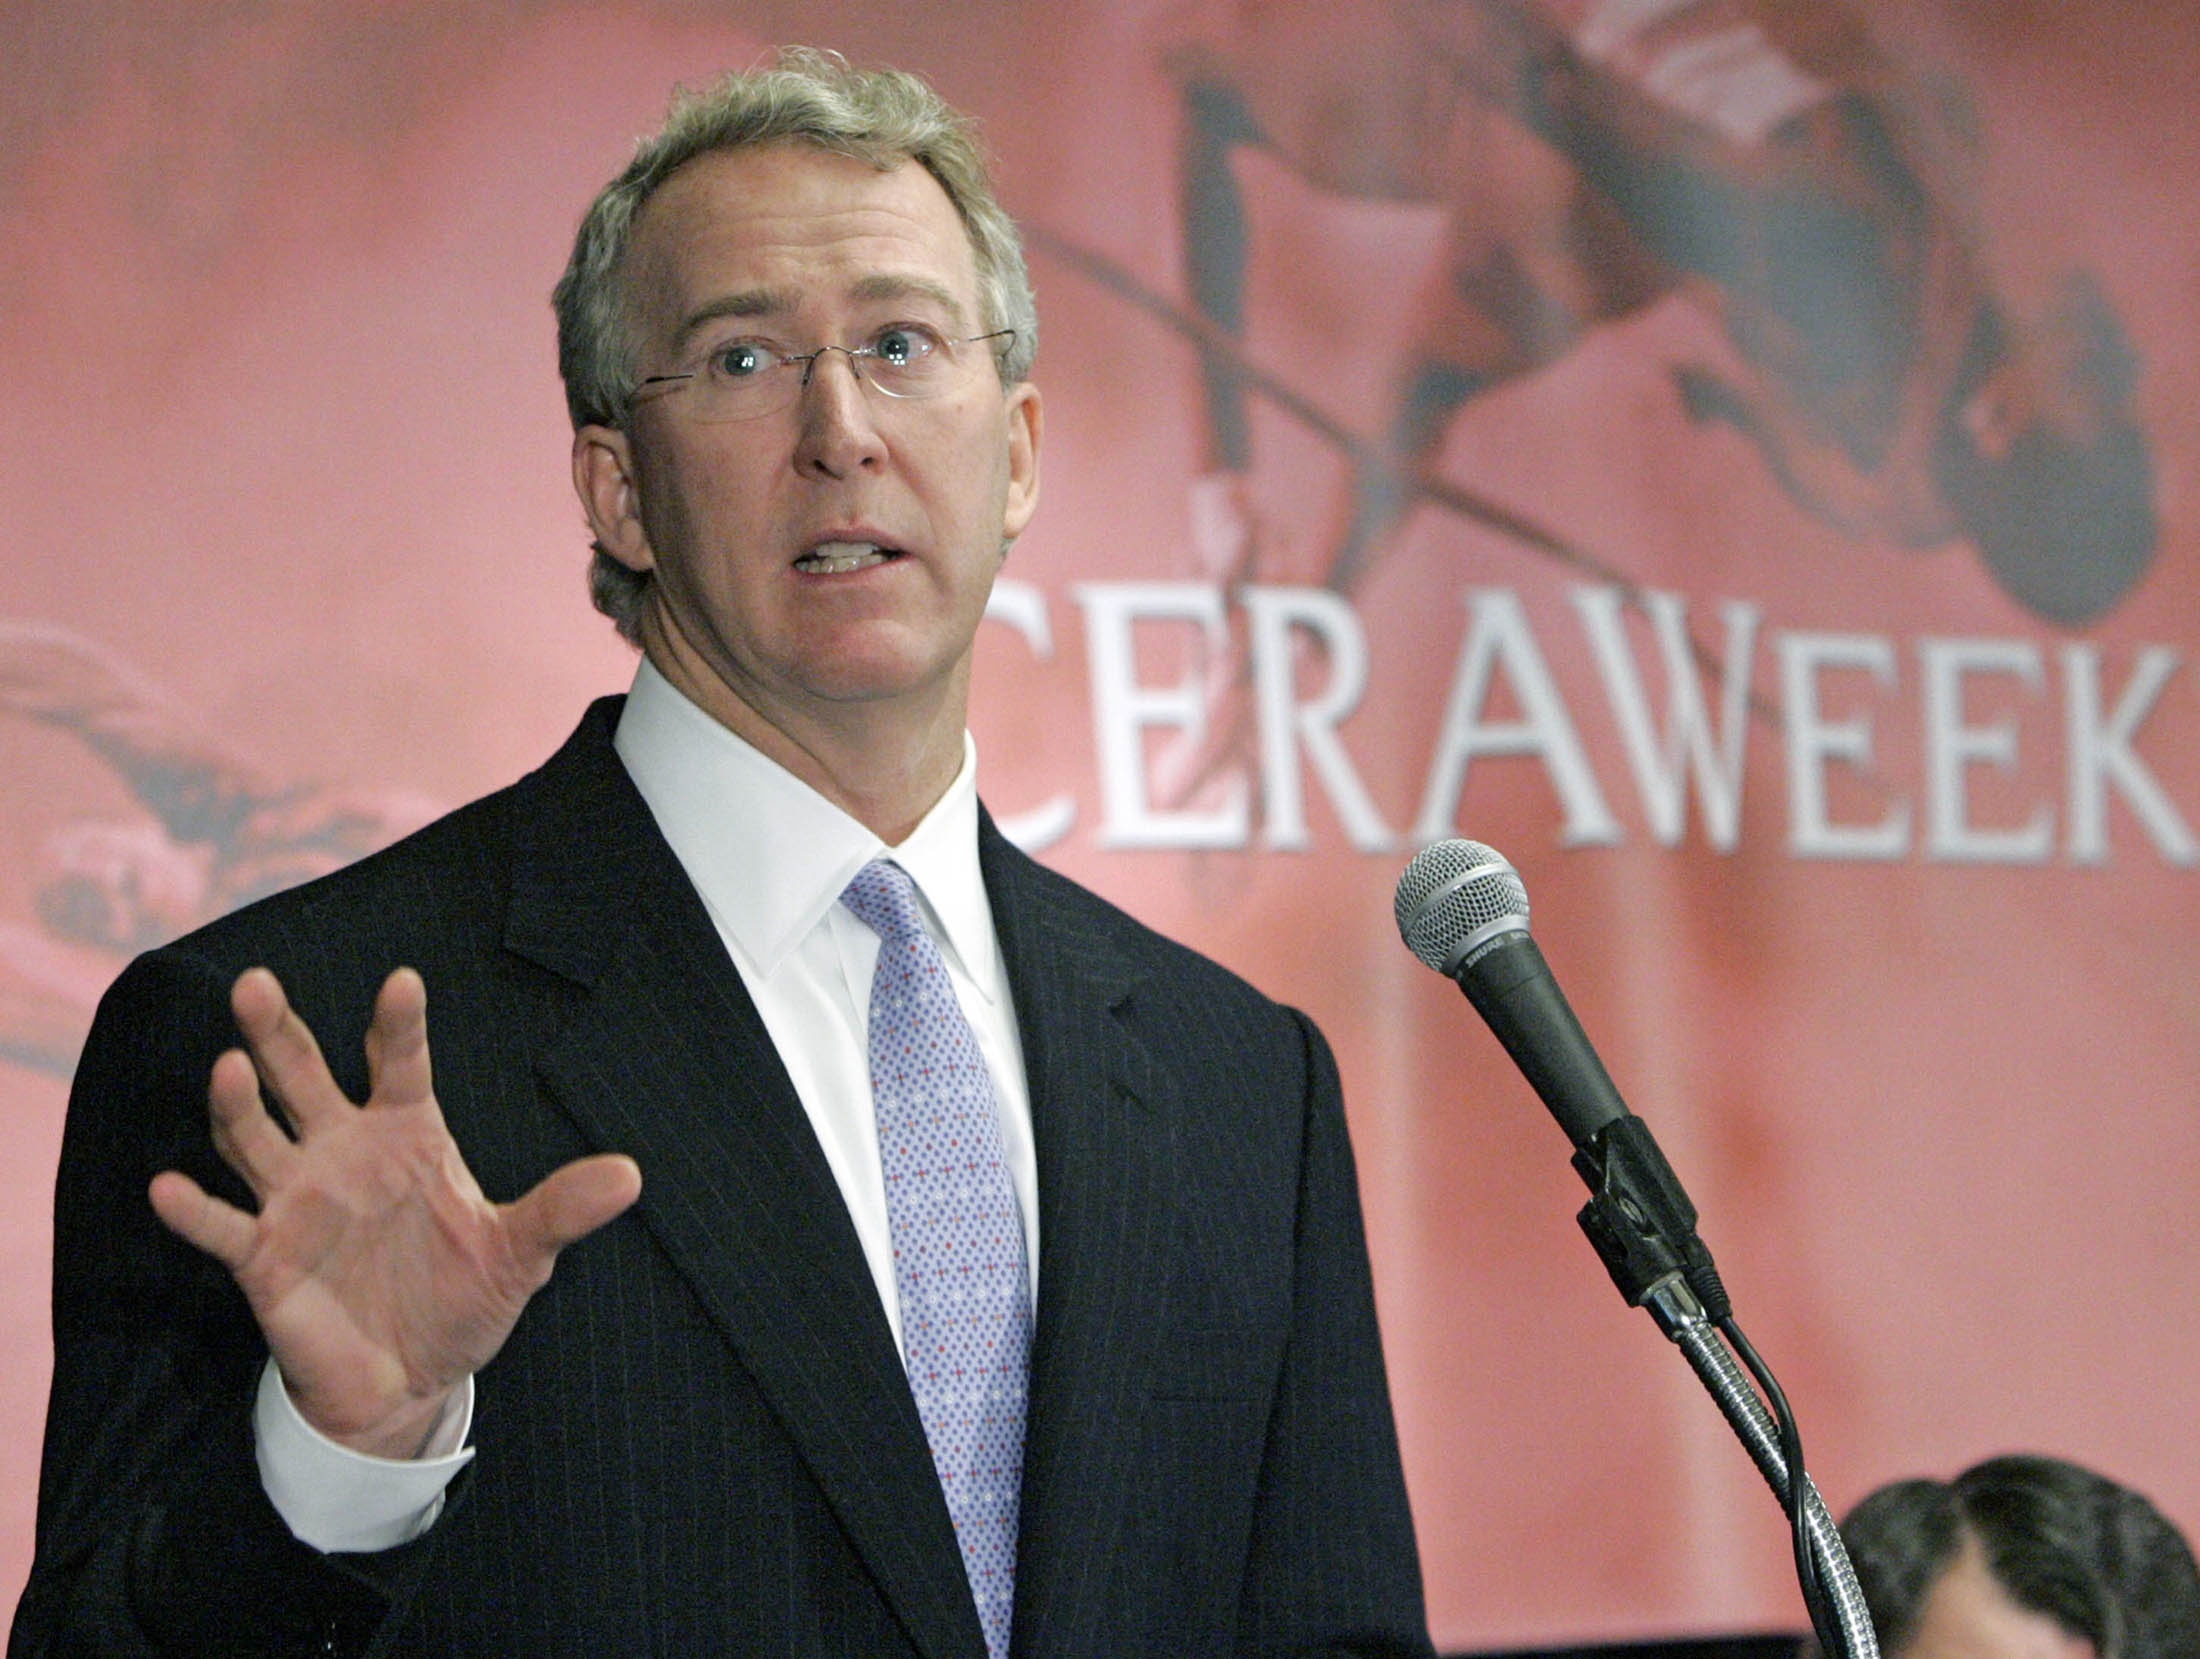 Aubrey K. McClendon, chairman and CEO of Chesapeake Energy C